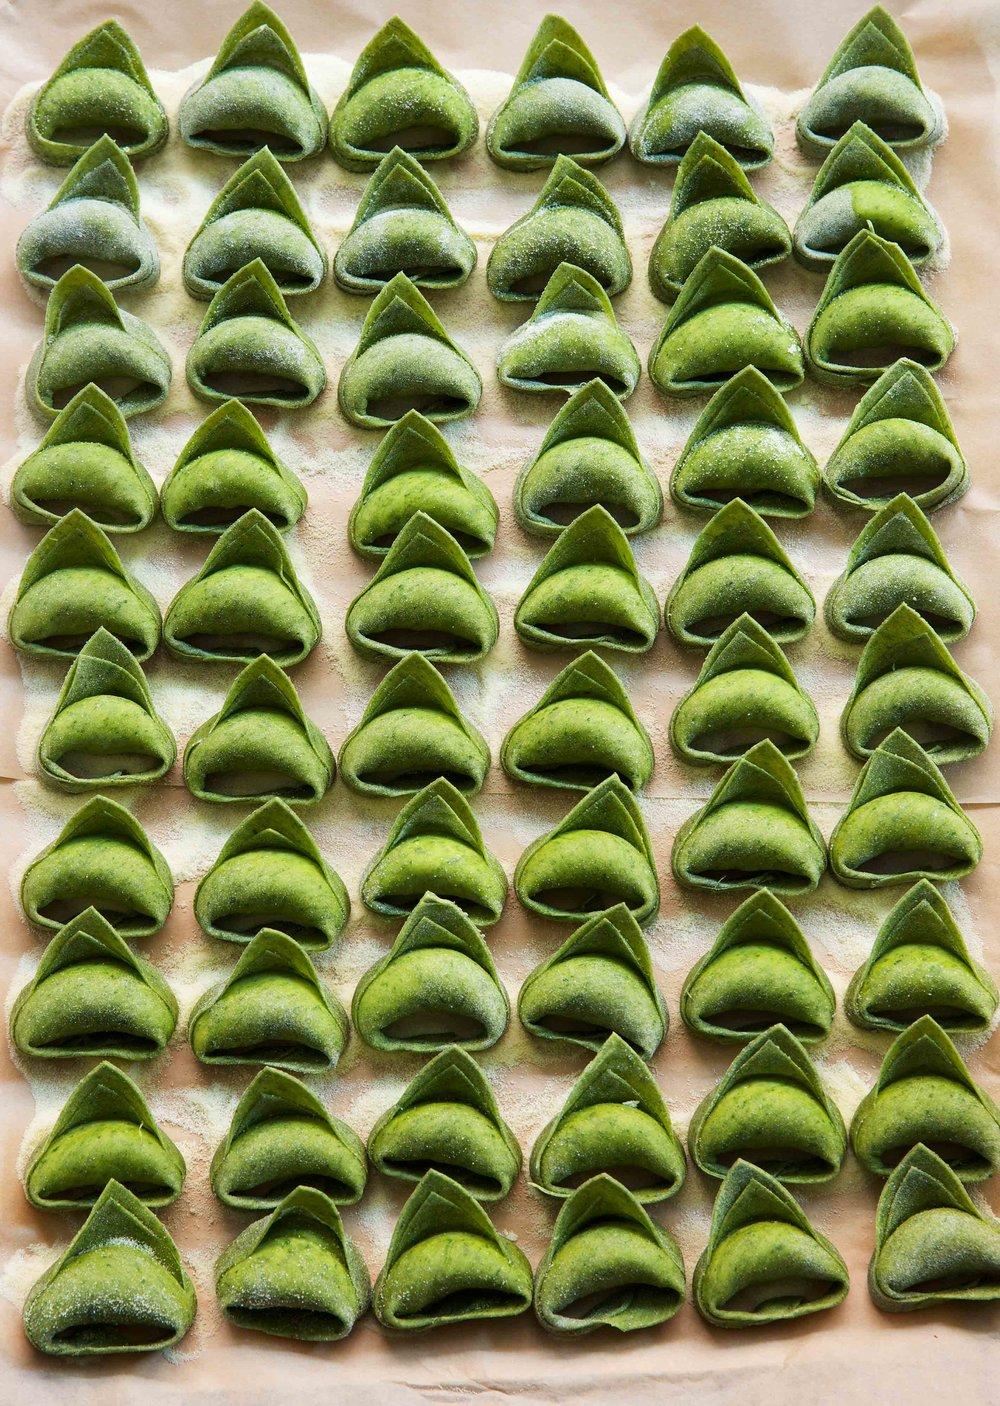 SpinachAgnlottiLinaStores_1938NW.jpg